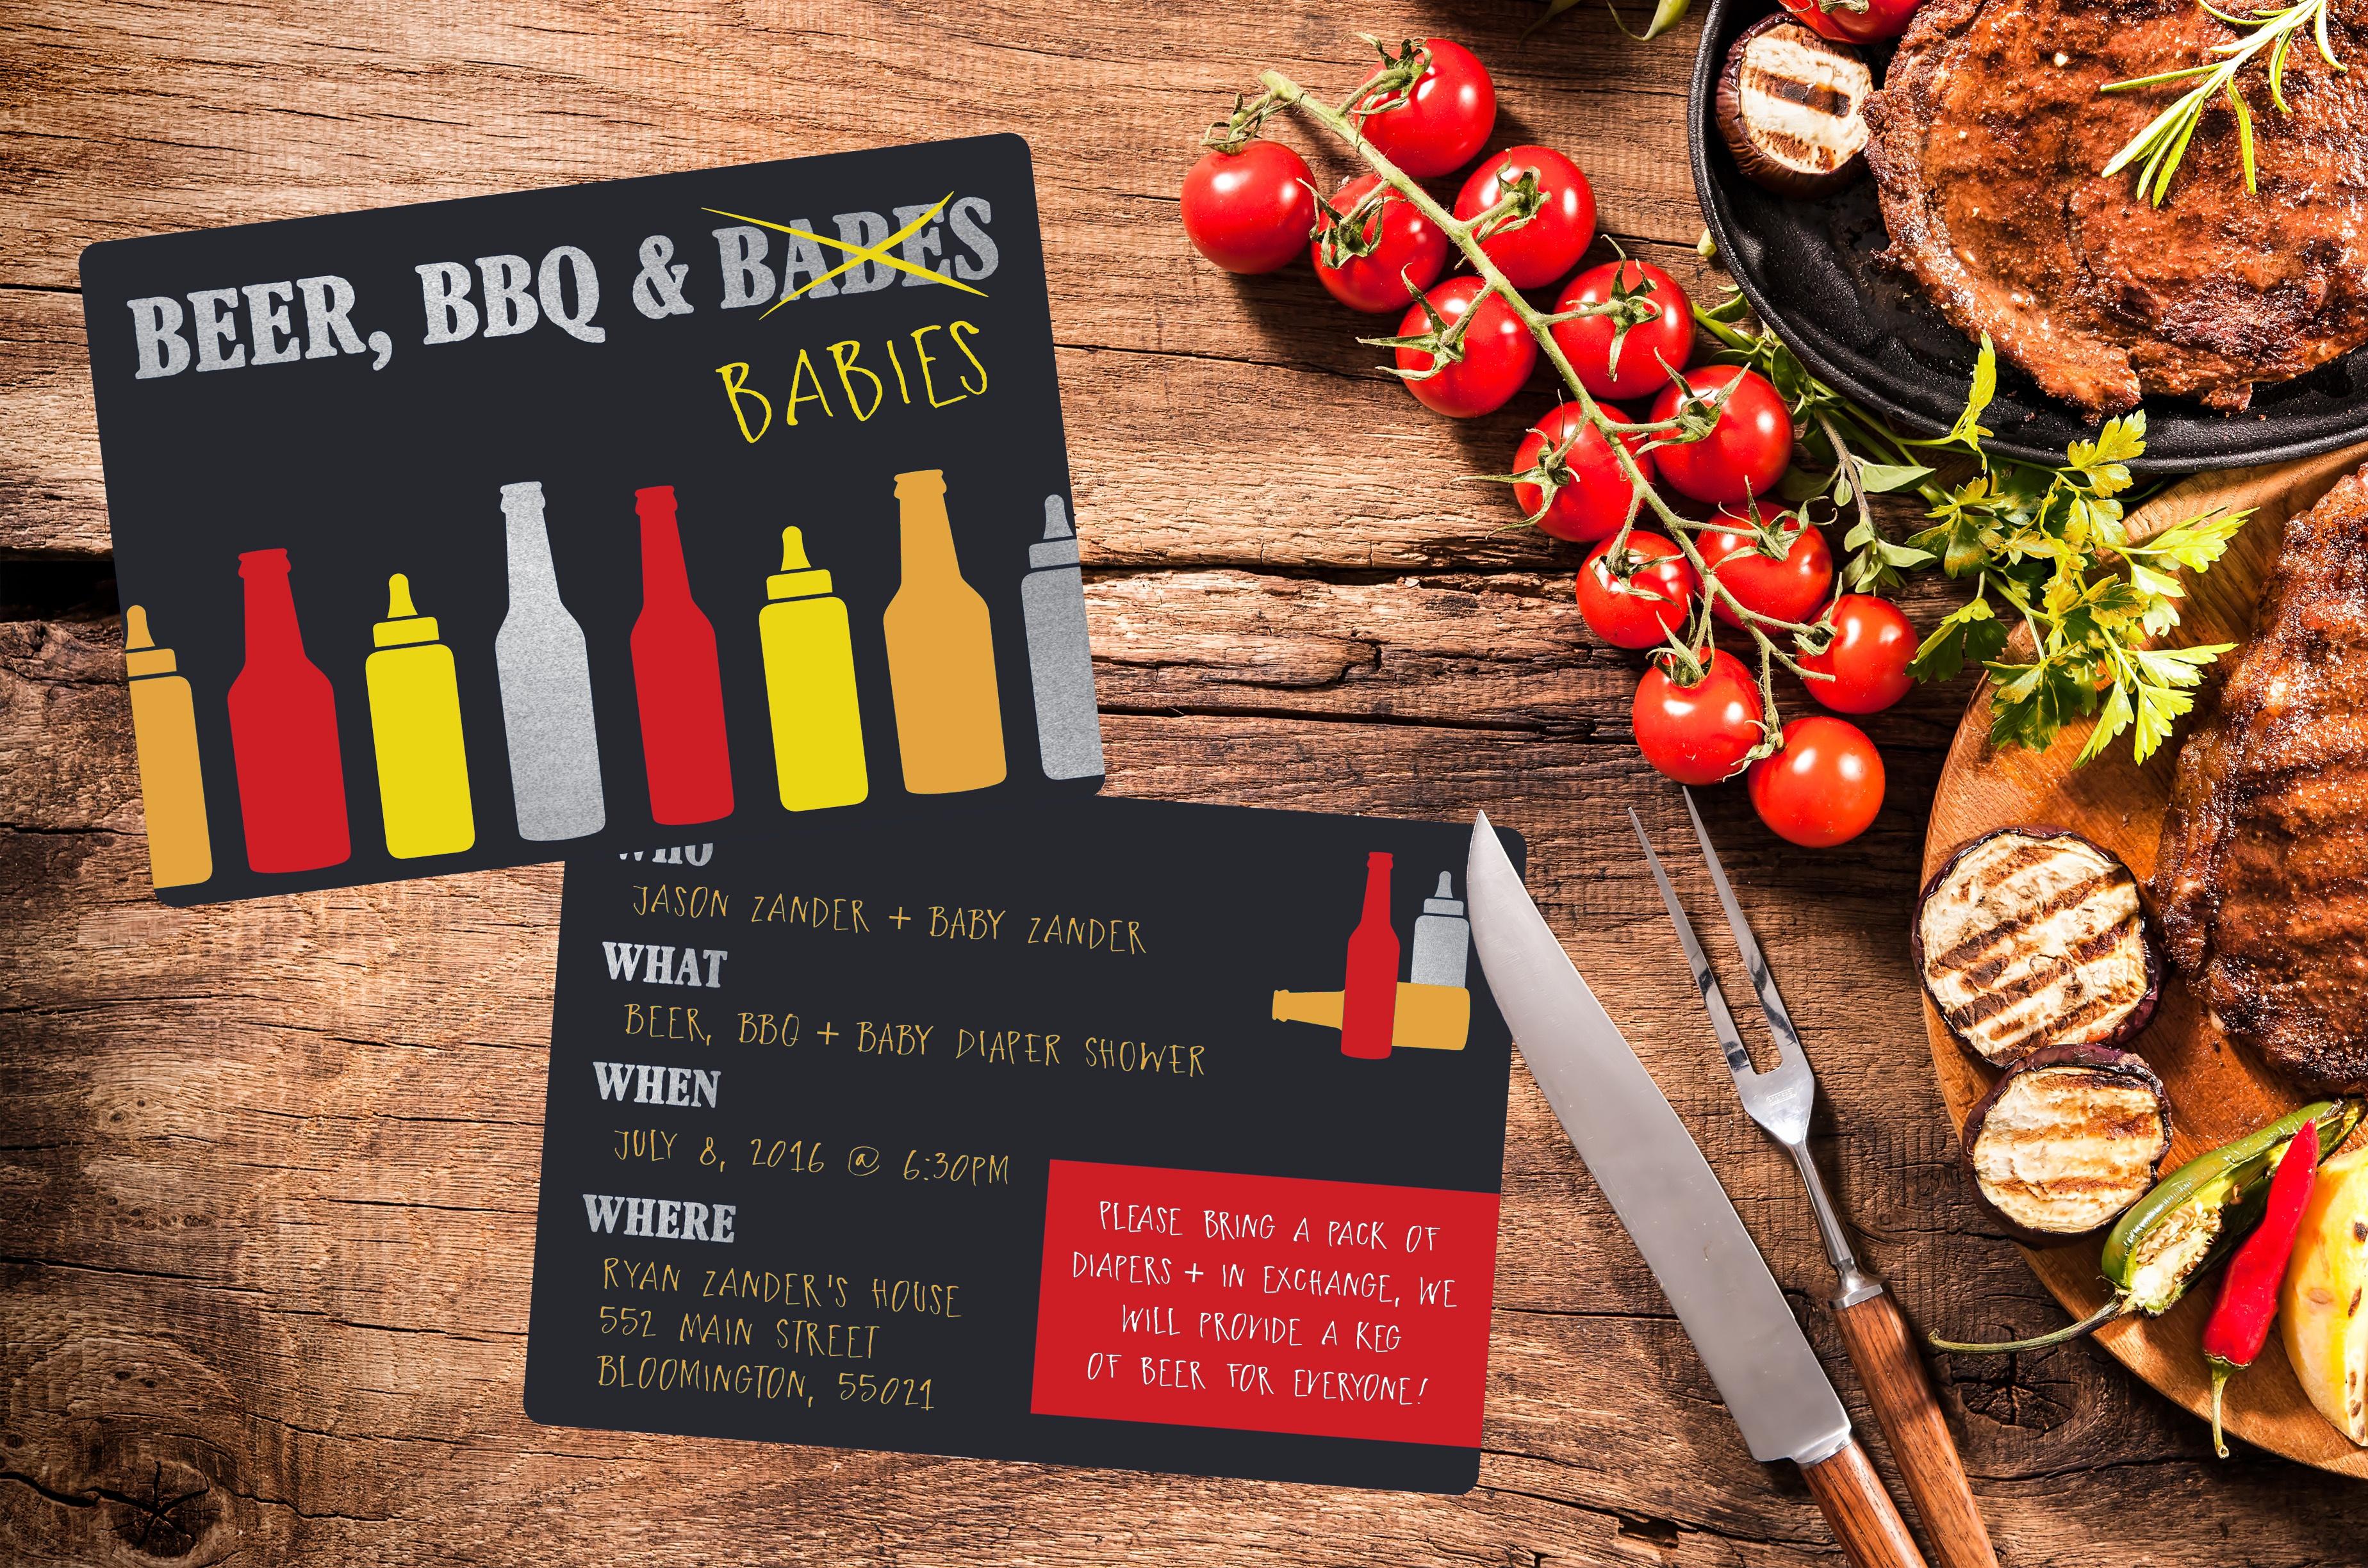 Beer, BBQ, & Babies baby shower invitation